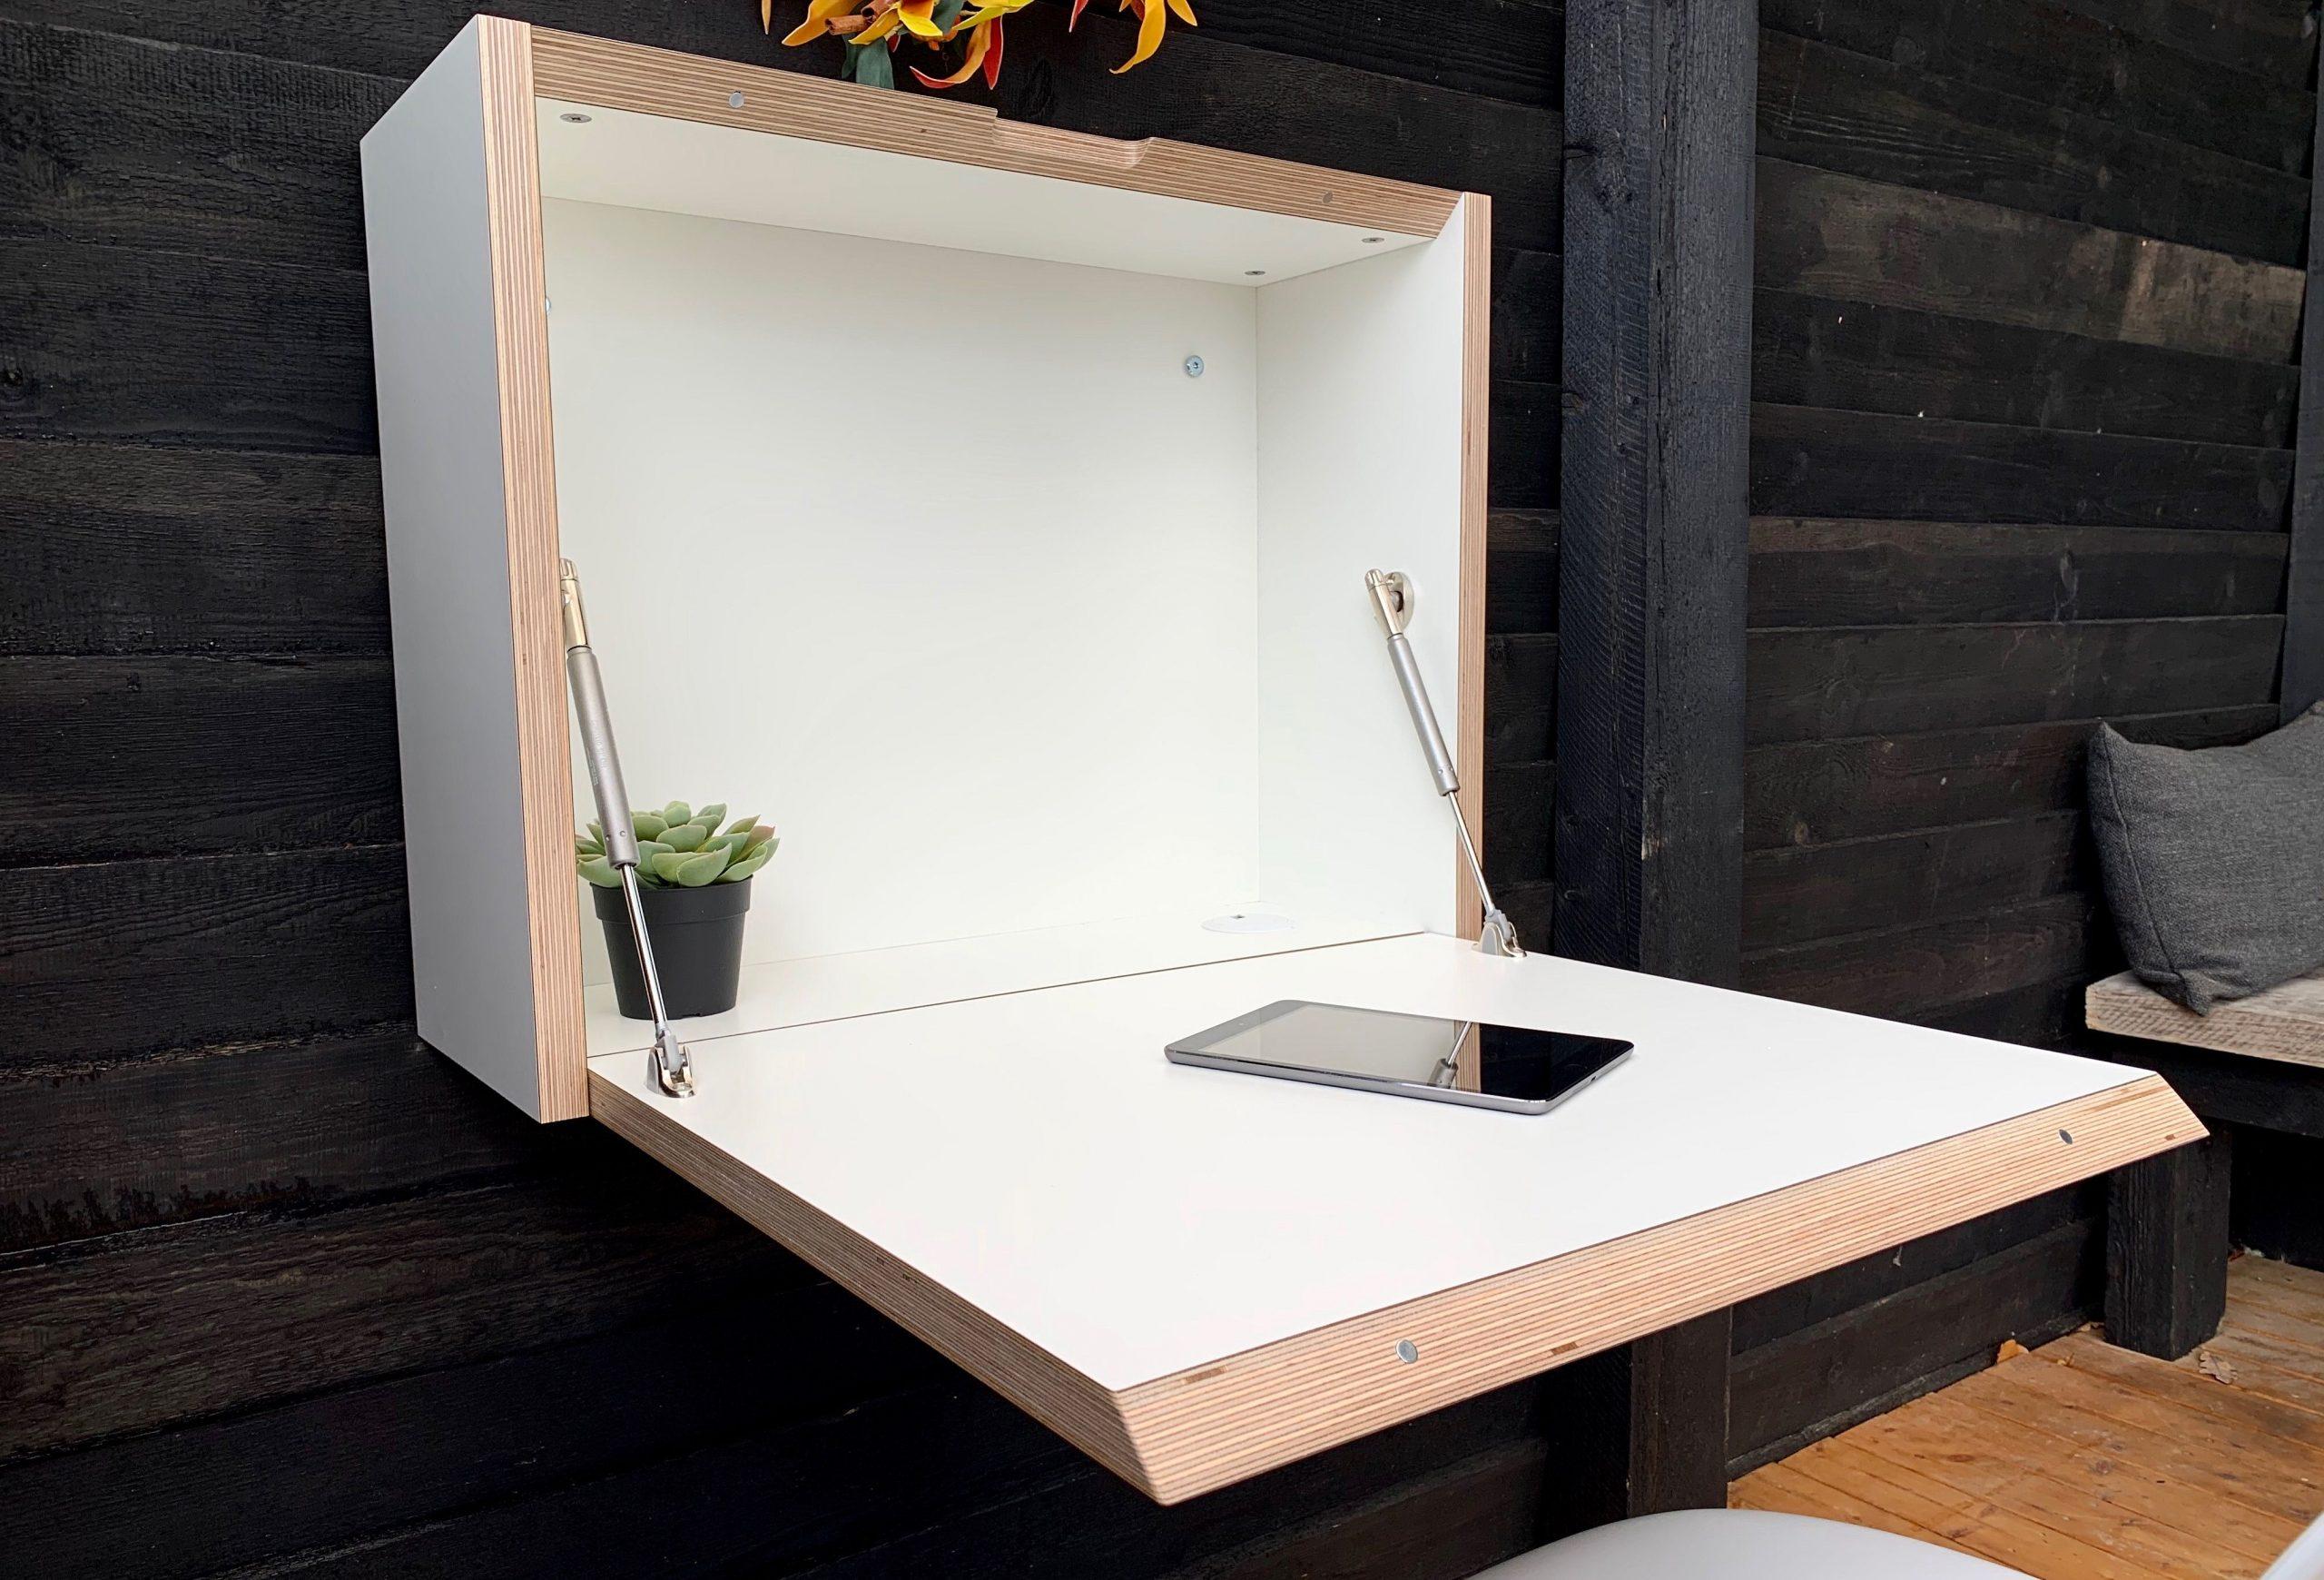 iMac Desk. Folding Desk. Office Desk. Space Saving Desk. Secretary Desk. Floating Desk.